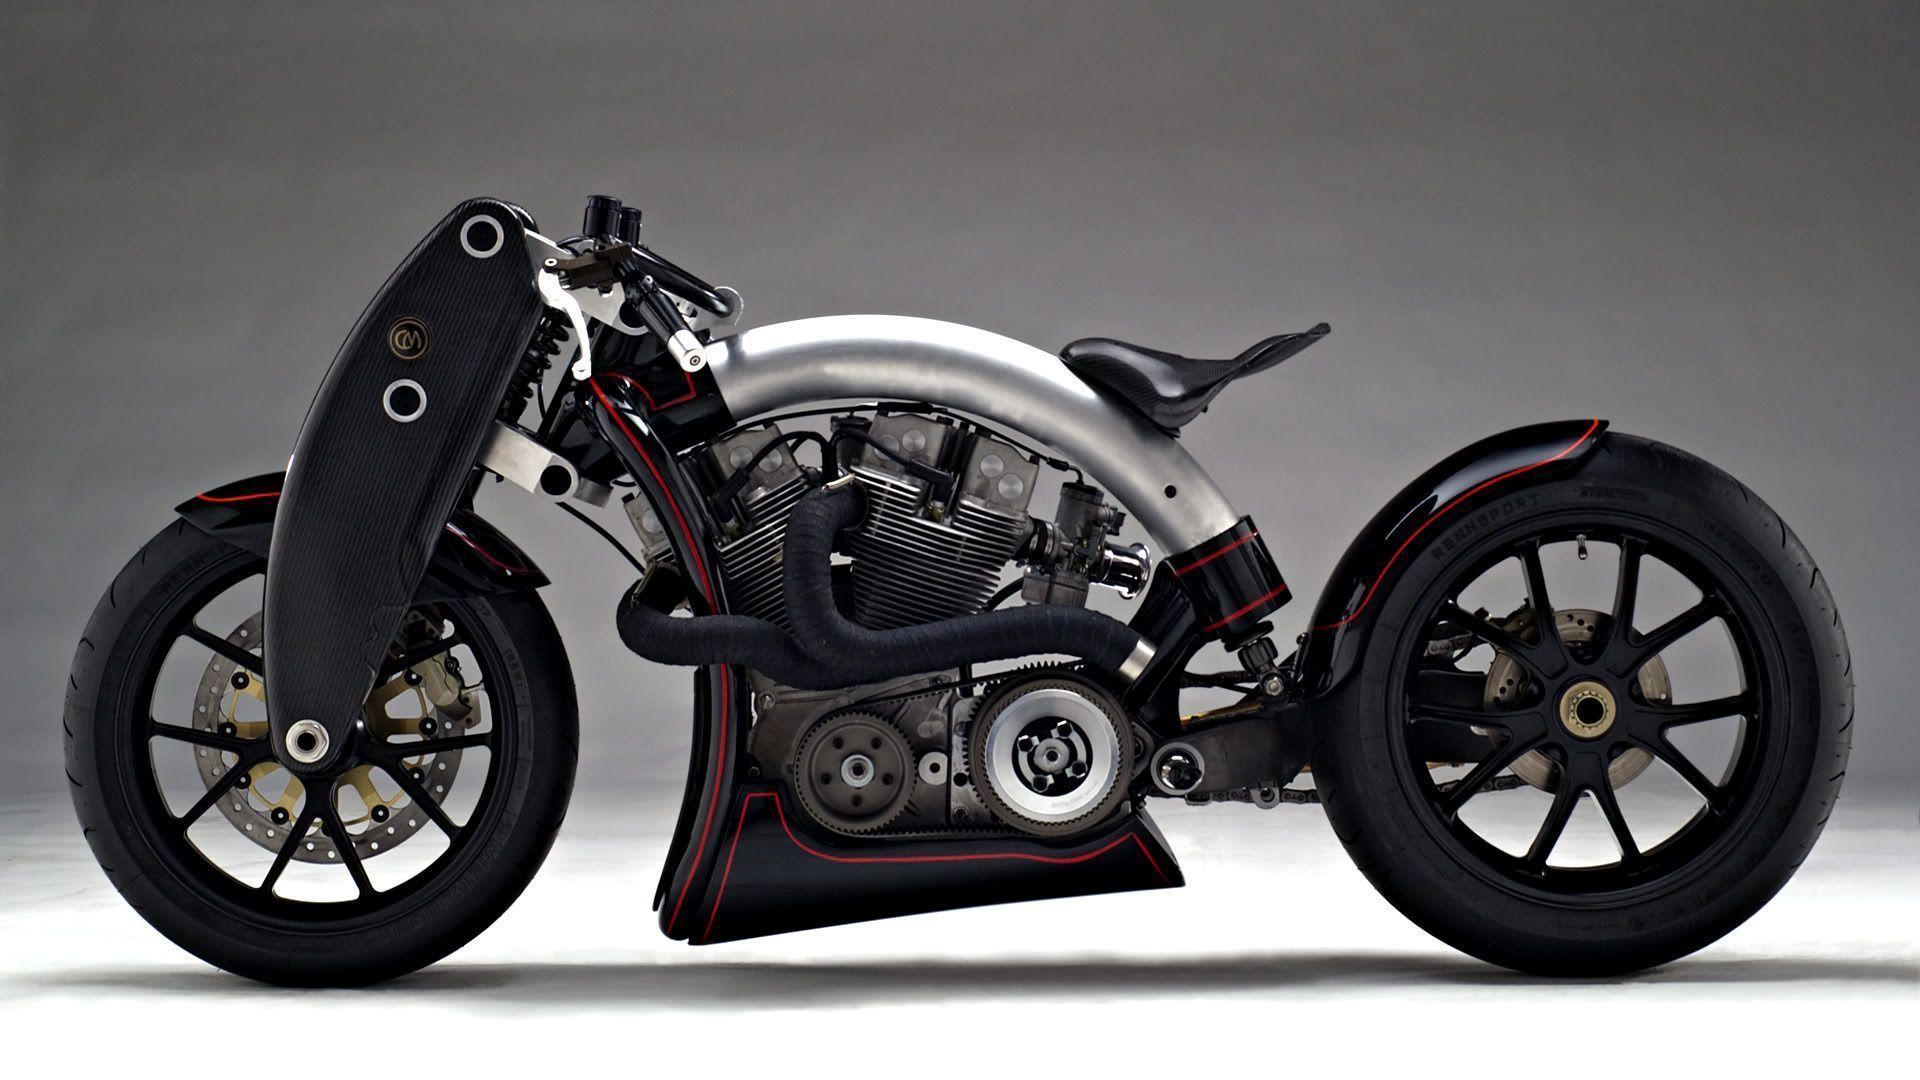 Luxury Motorcycle Hd Wallpapers: Motorcycle Wallpapers HD